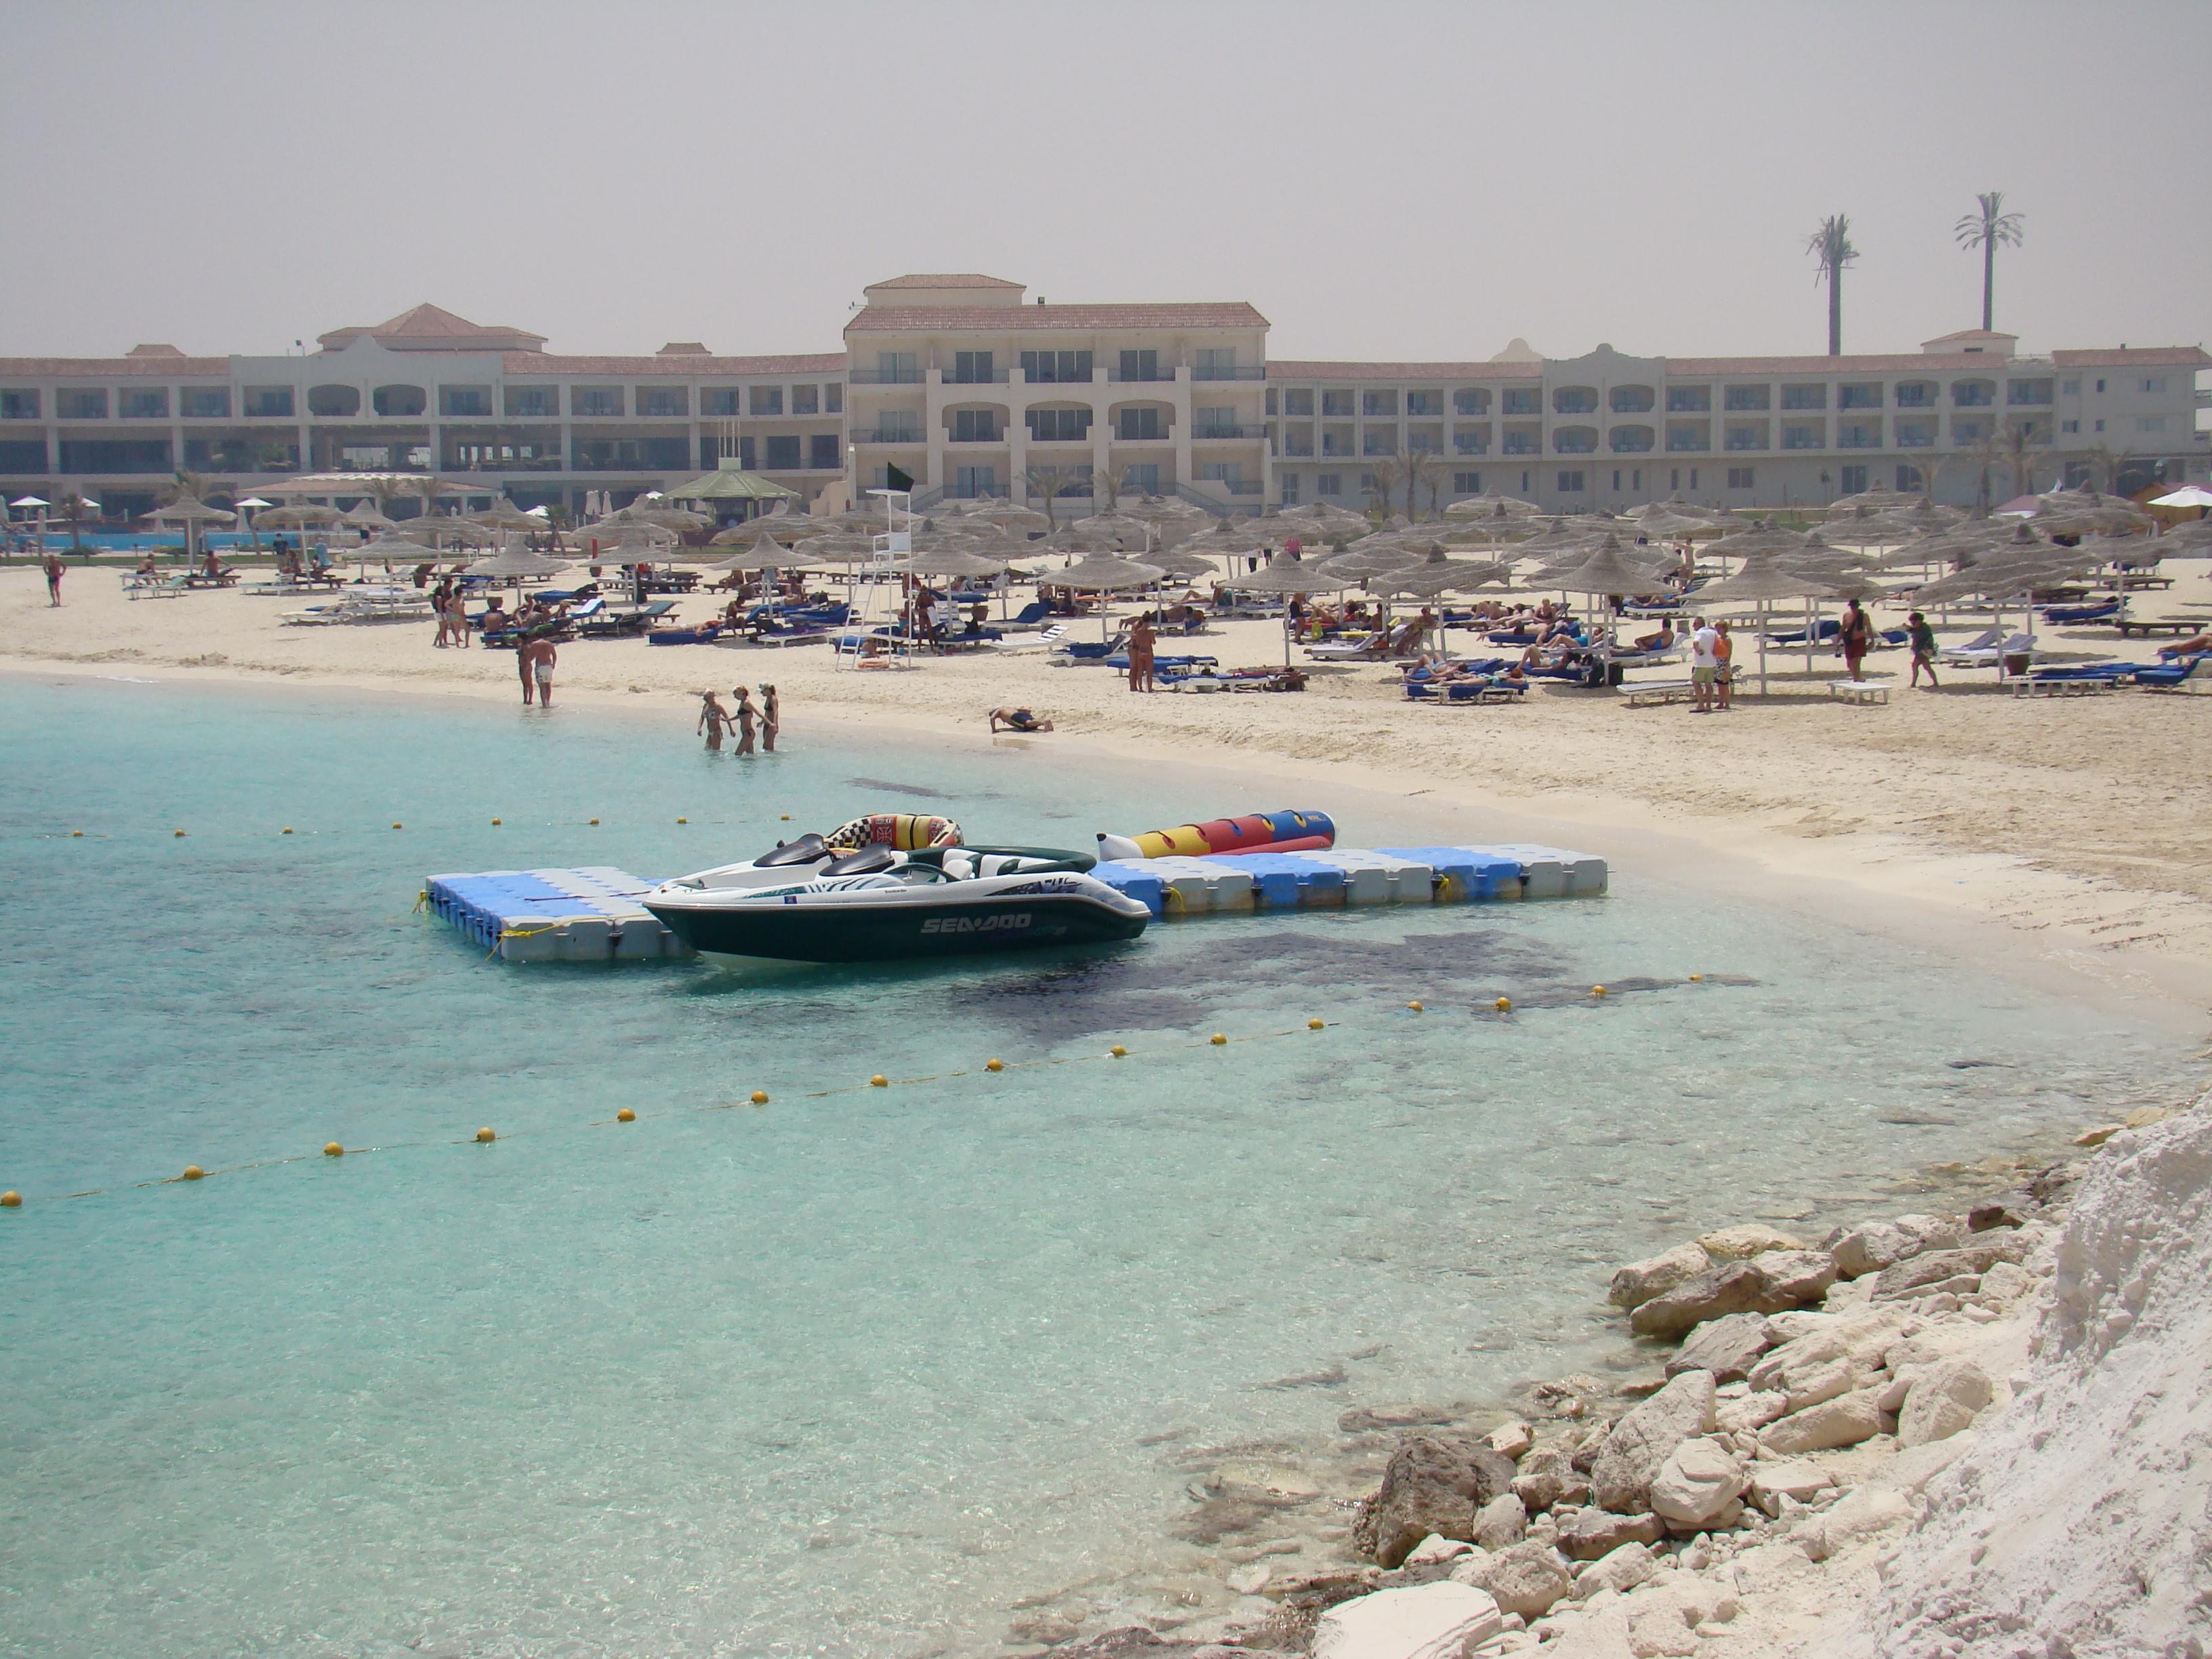 Alexandria Egypt and Mediterranean coast • Tigrest Travel Blog